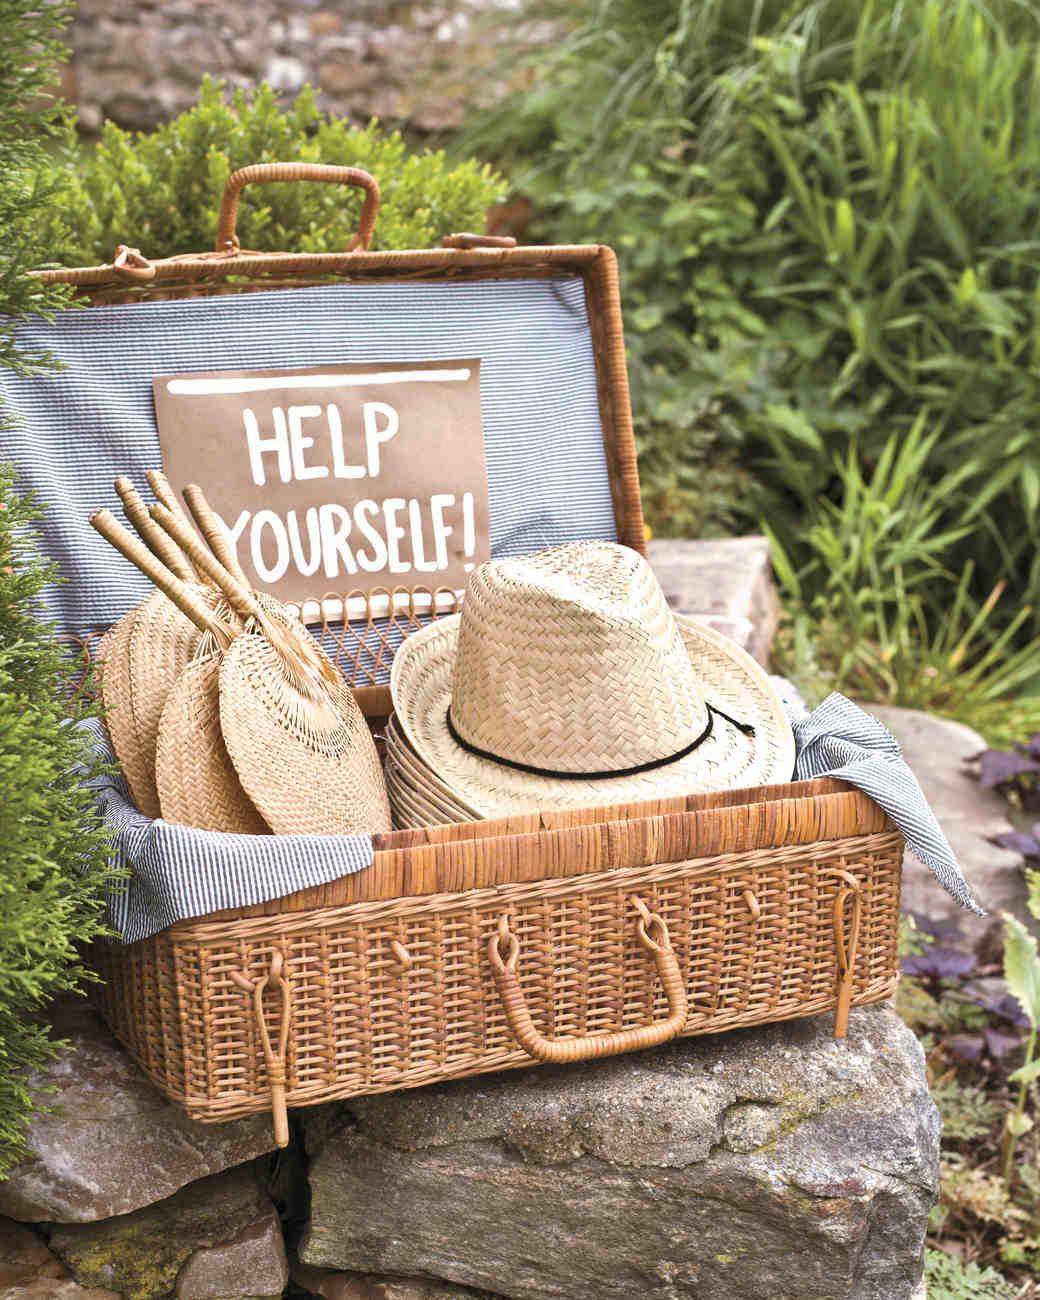 wicker-suitcase-panama-hat-details092-mwd106246.jpg